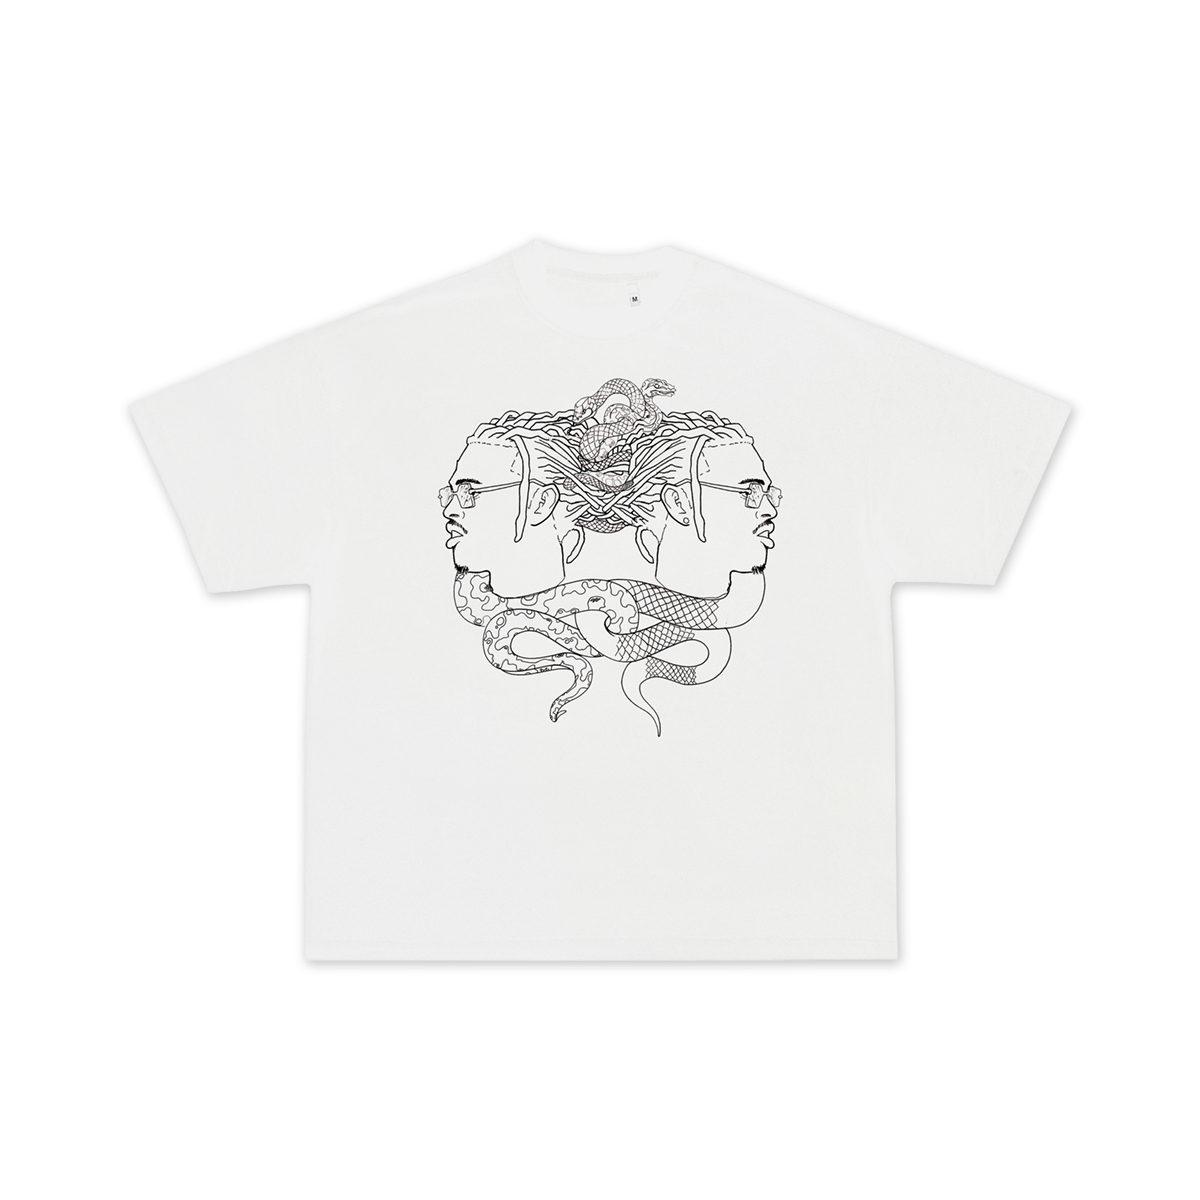 Gemini Snake T-Shirt + Wunna Digital Download